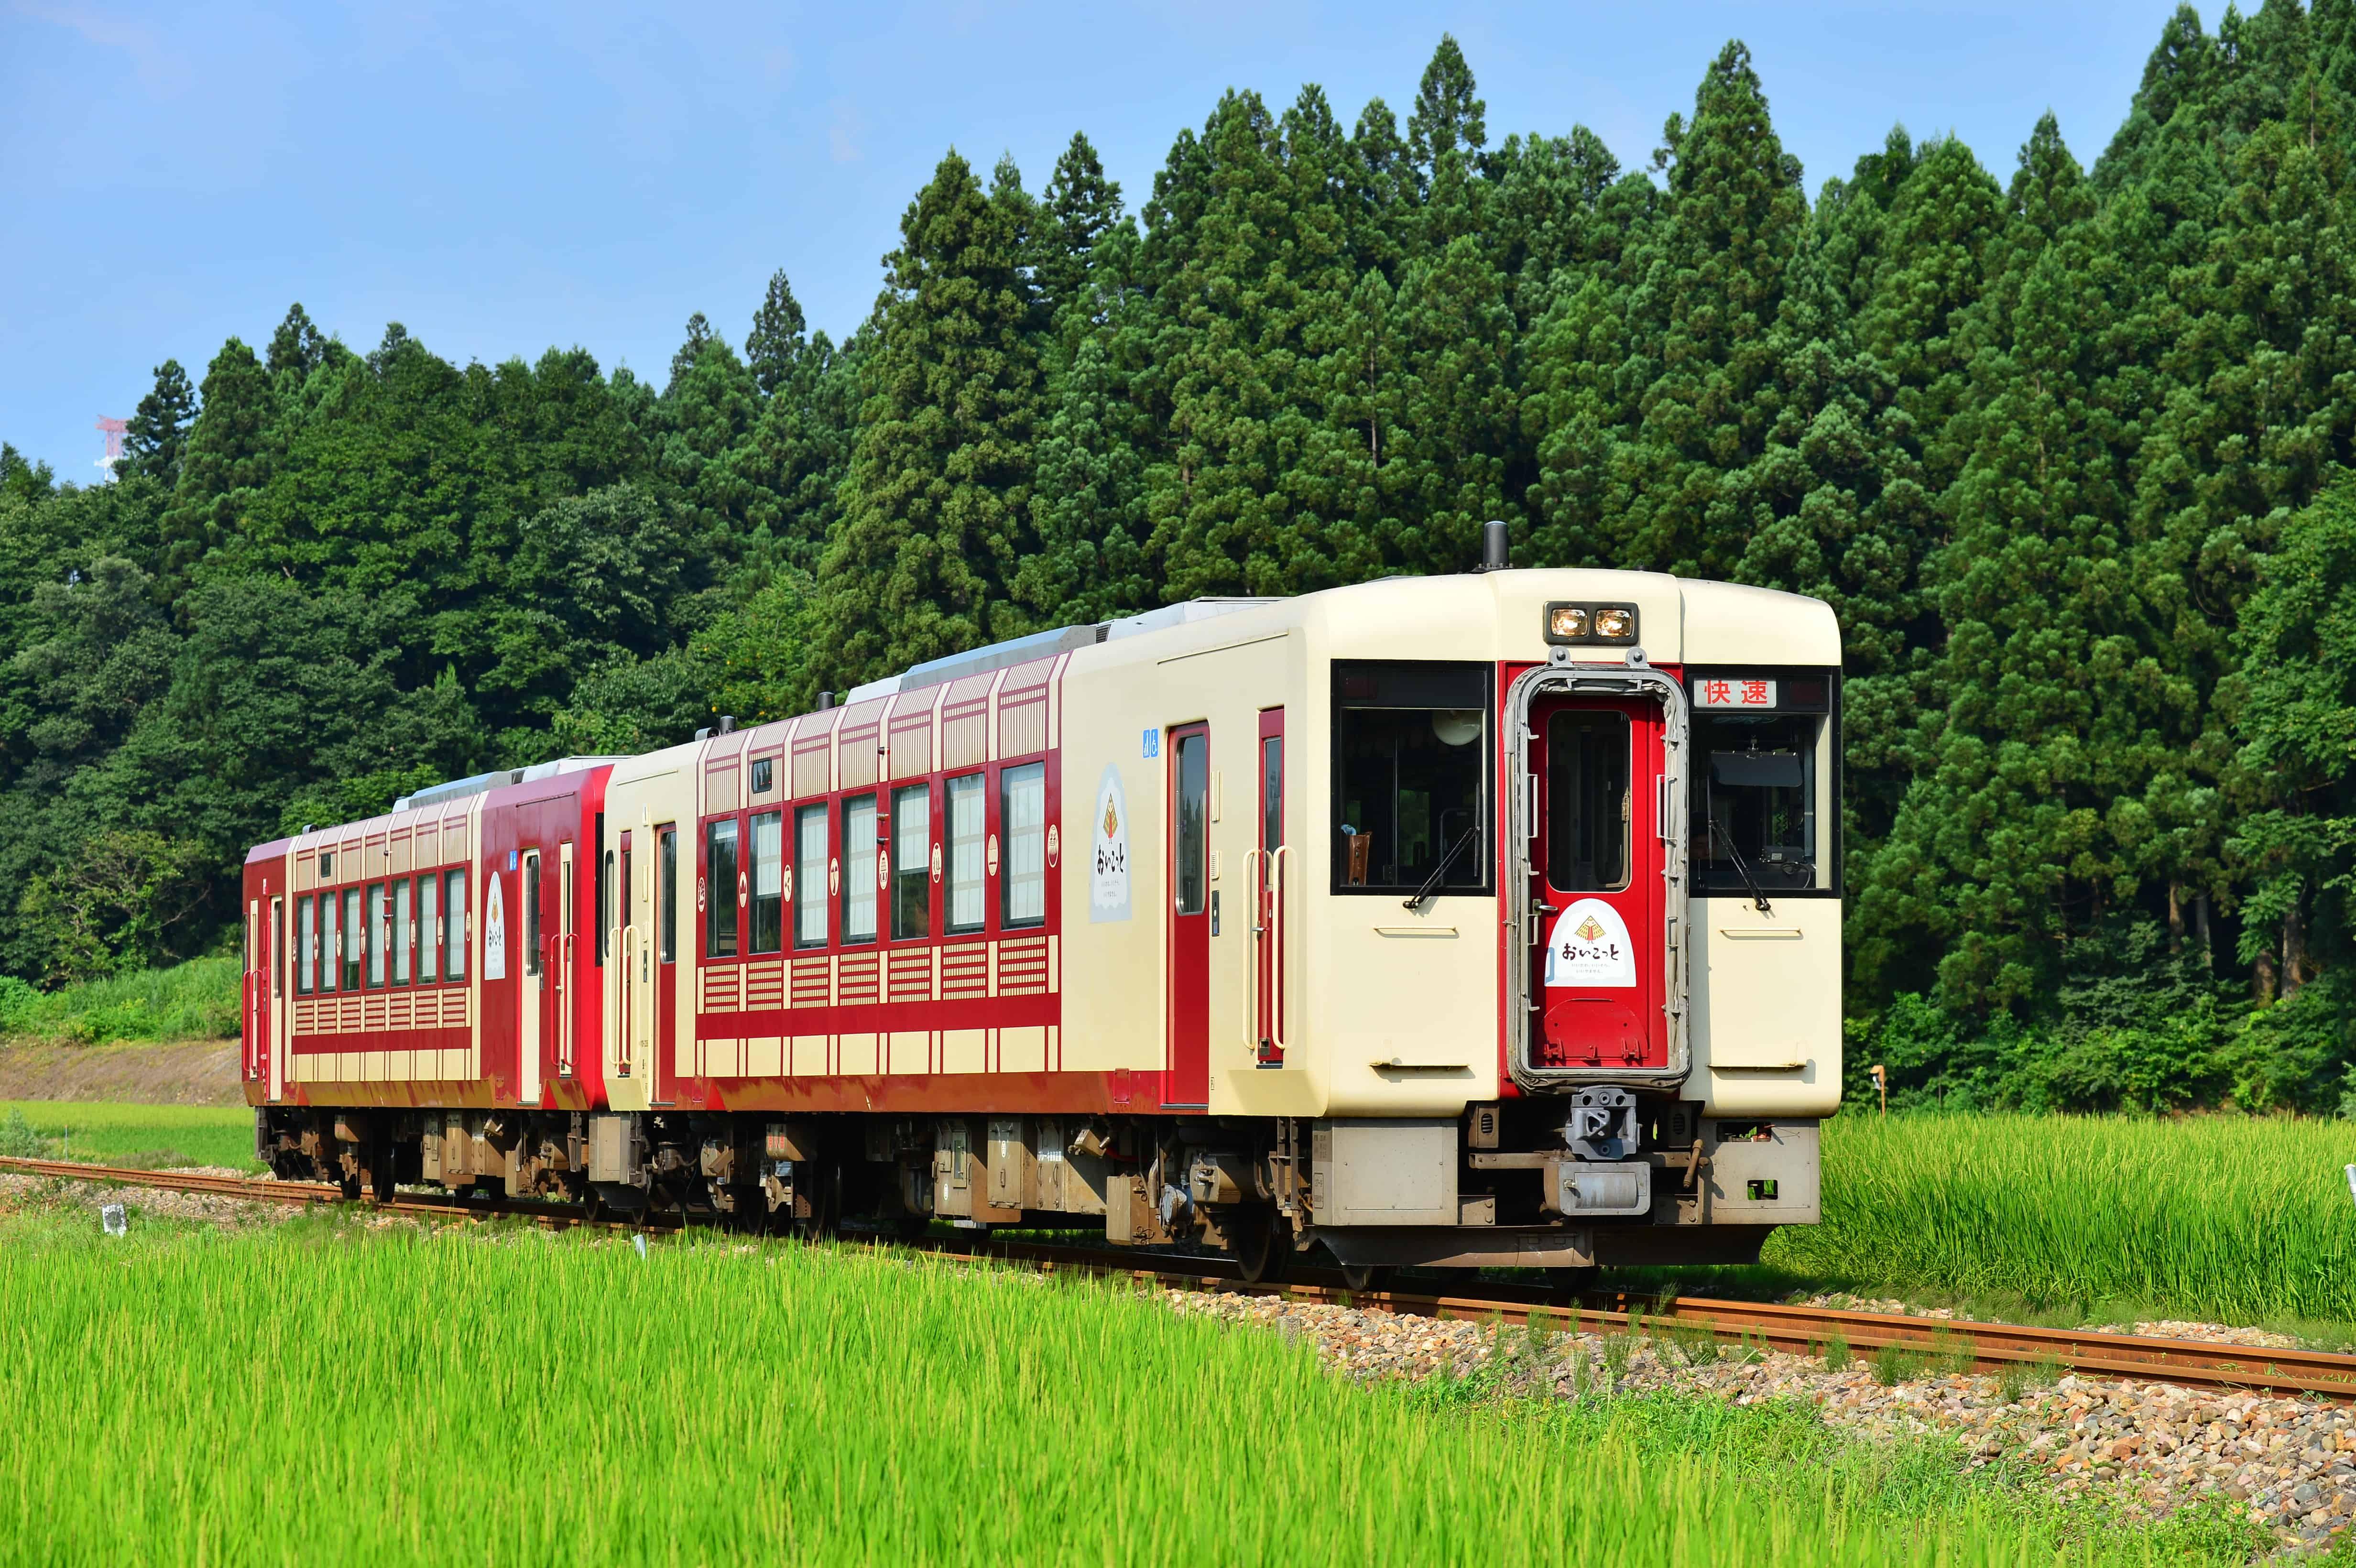 Joyful train - Oykot